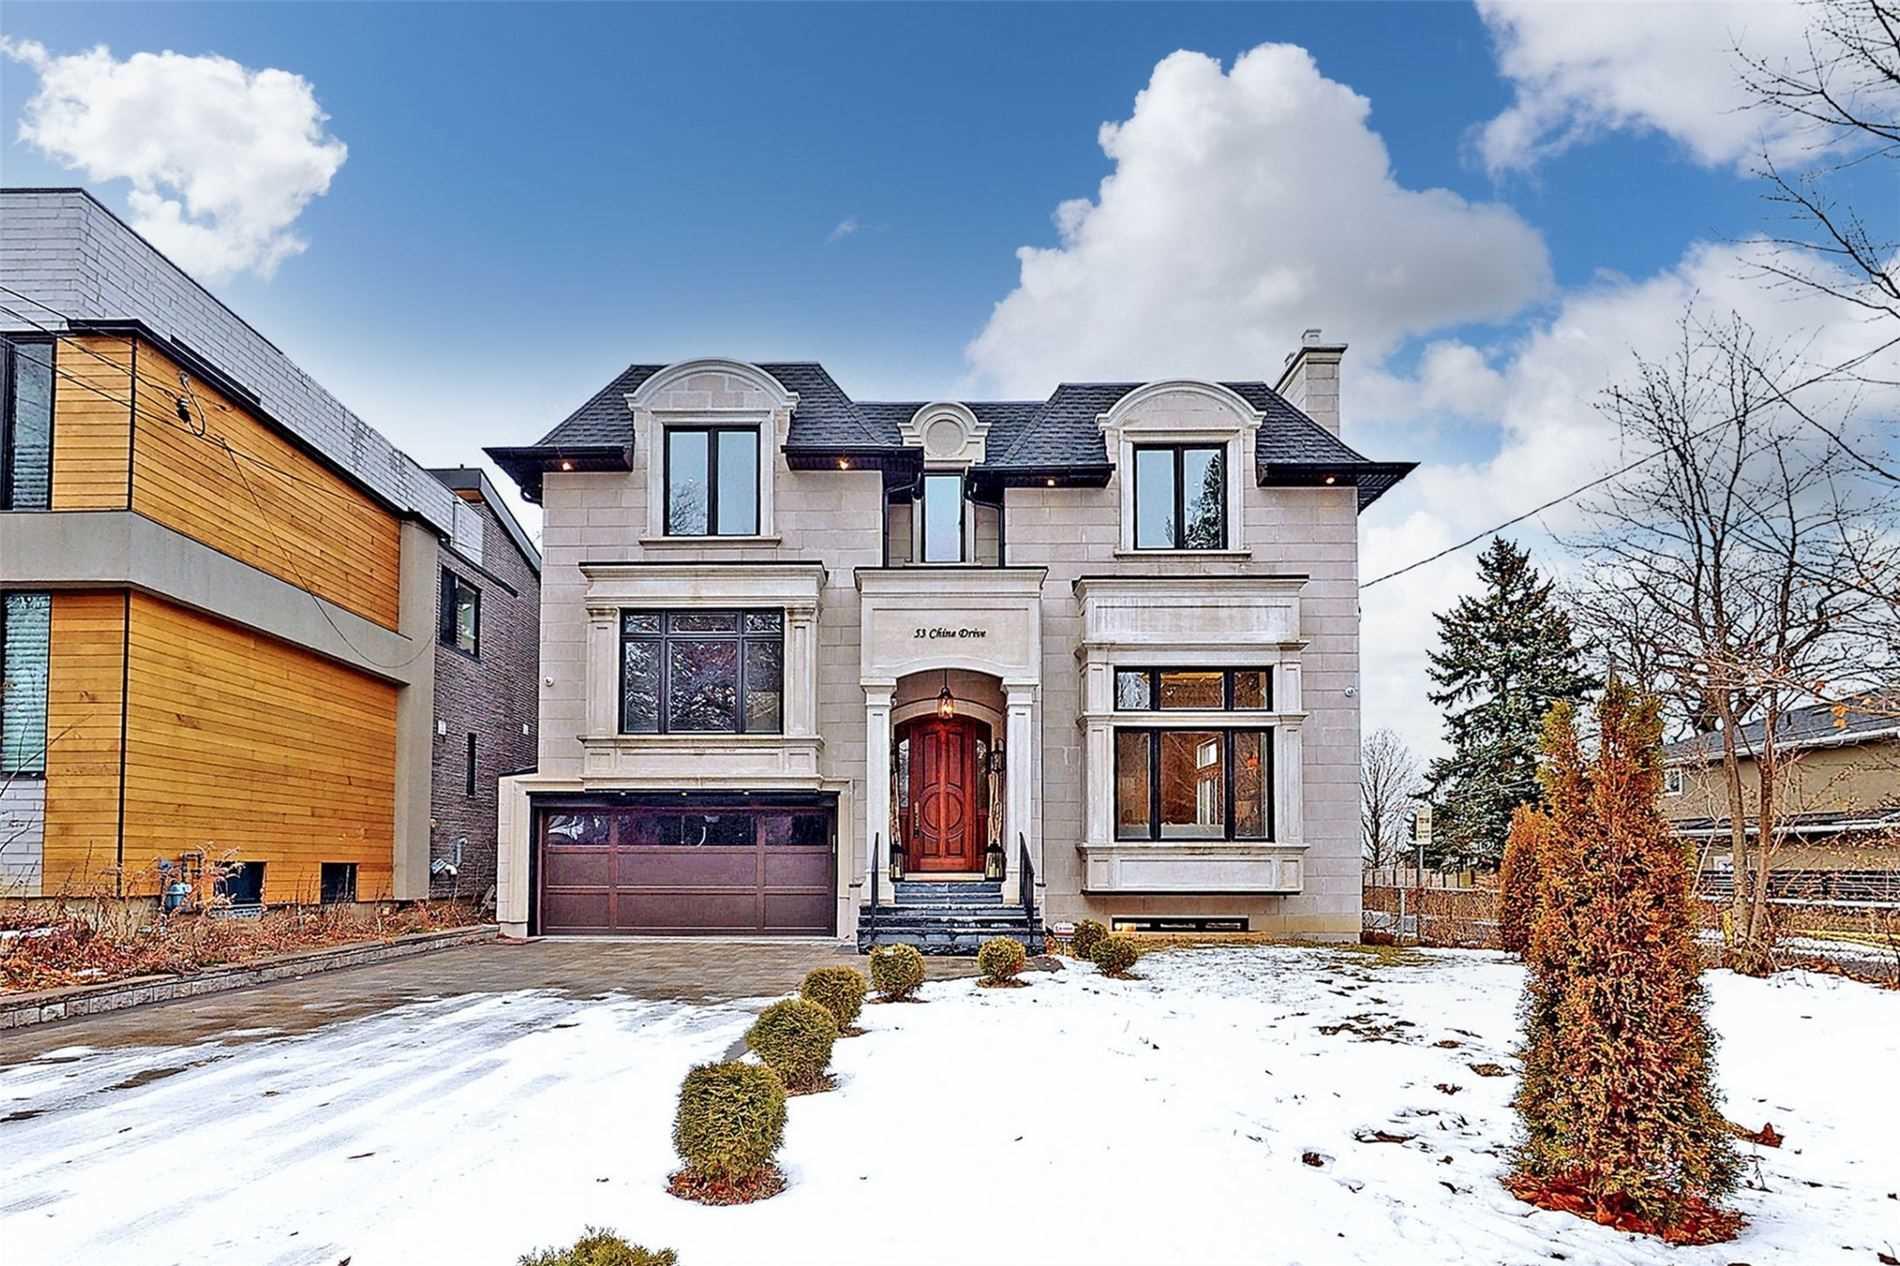 53 Chine Dr, Toronto, Ontario M1M 2K8, 4 Bedrooms Bedrooms, 9 Rooms Rooms,7 BathroomsBathrooms,Detached,For Sale,Chine,E5085259